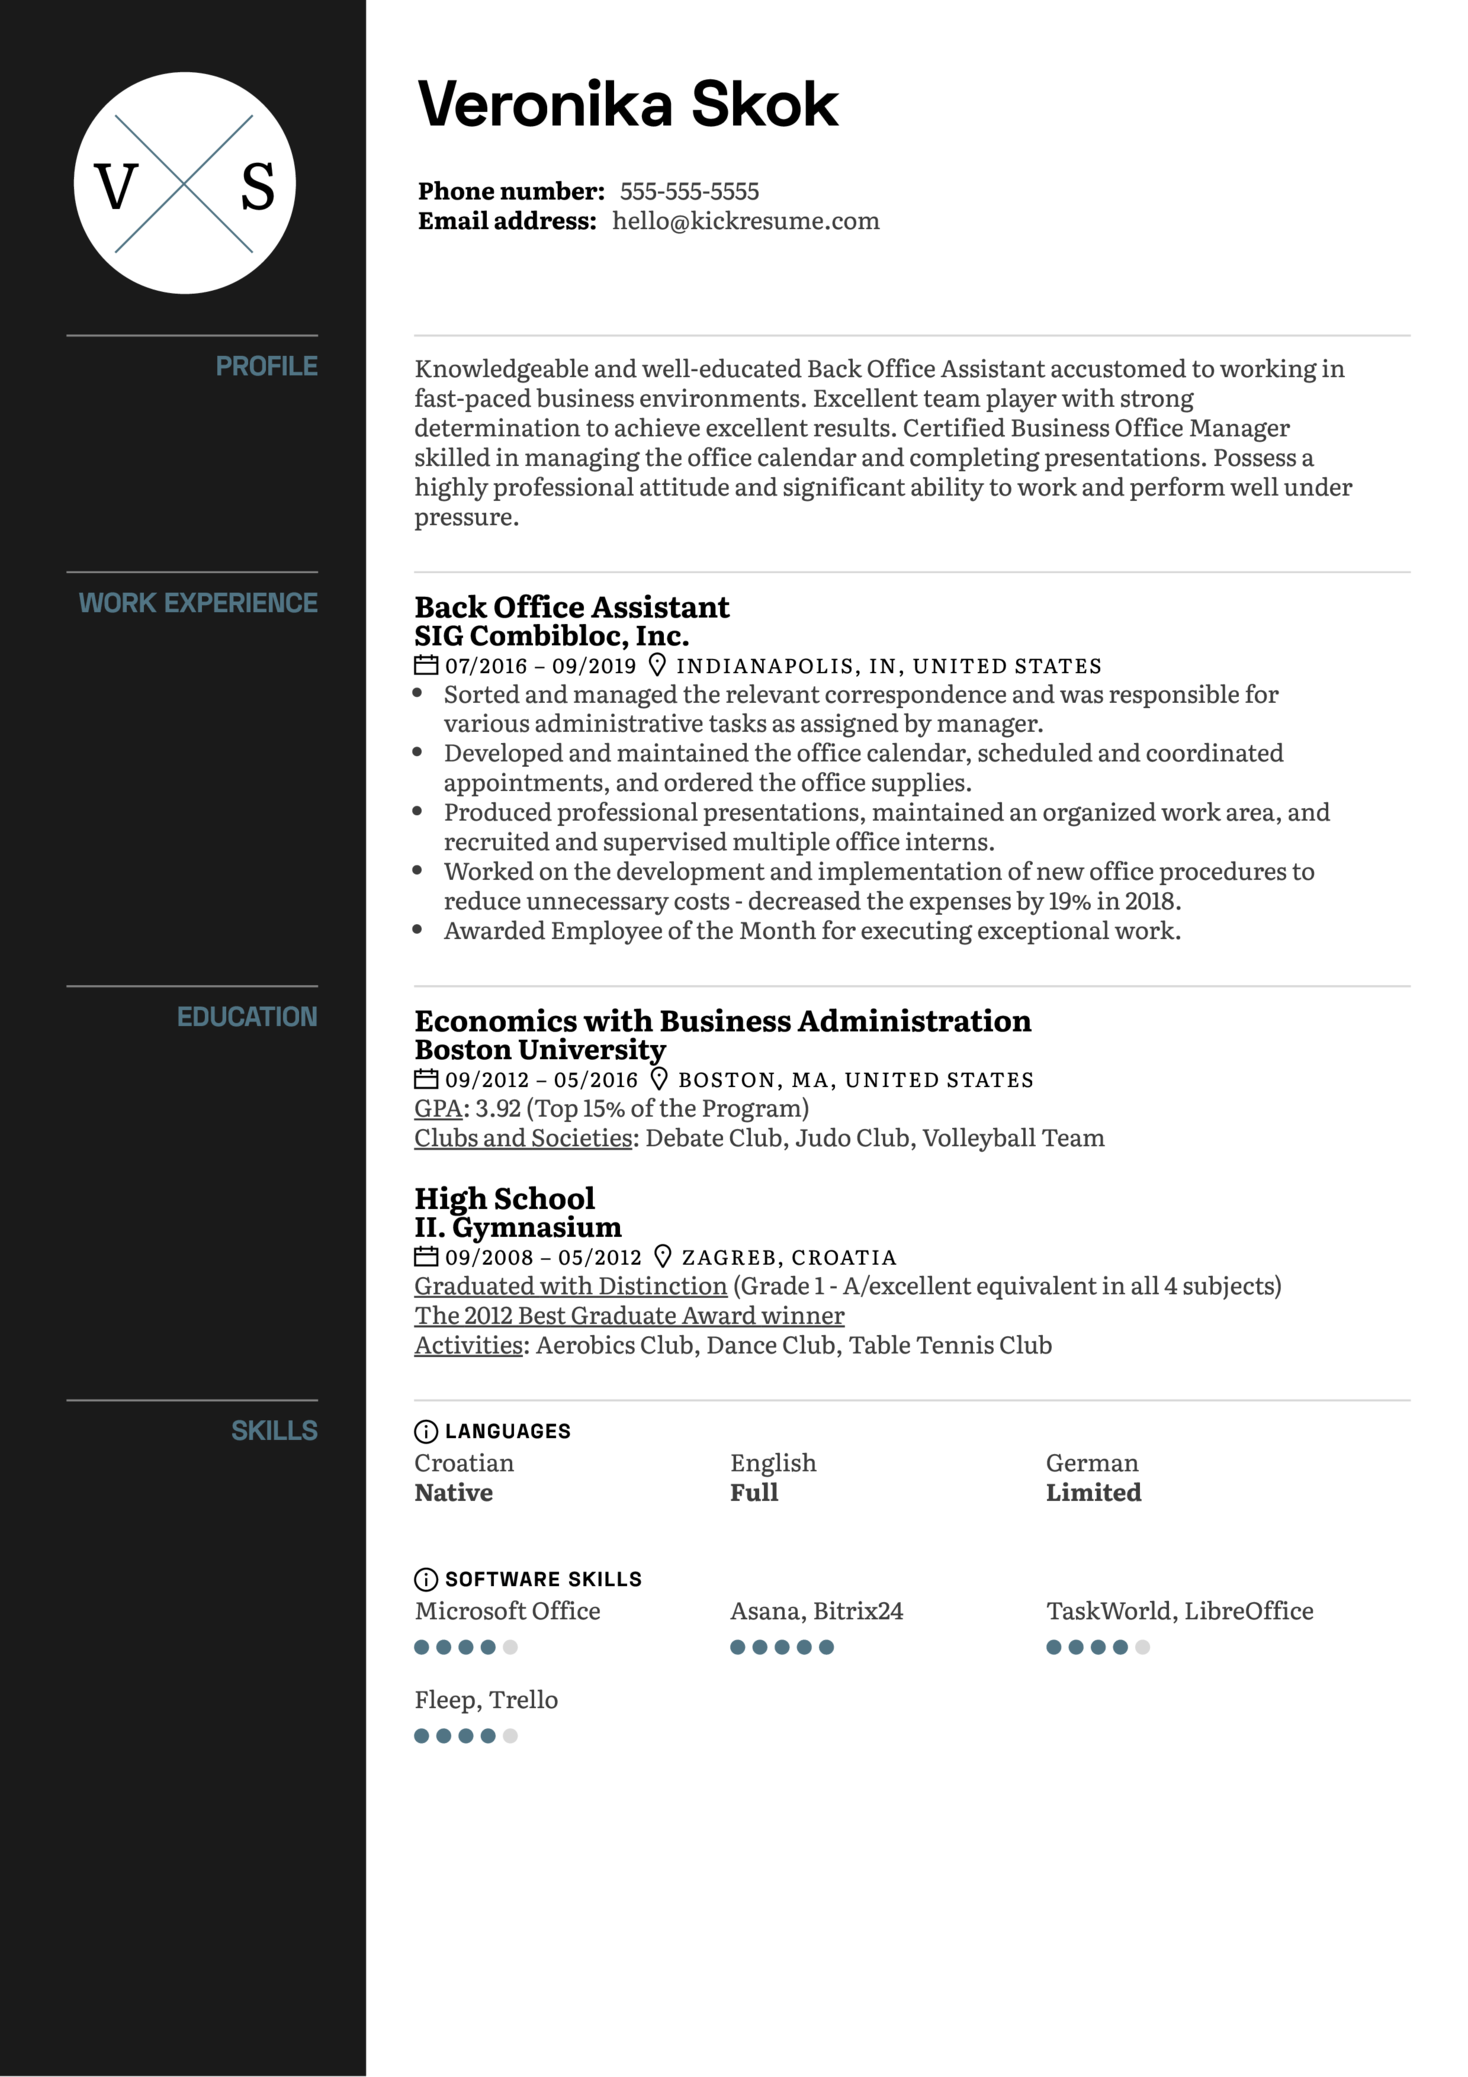 Back Office Assistant Resume Sample (parte 1)